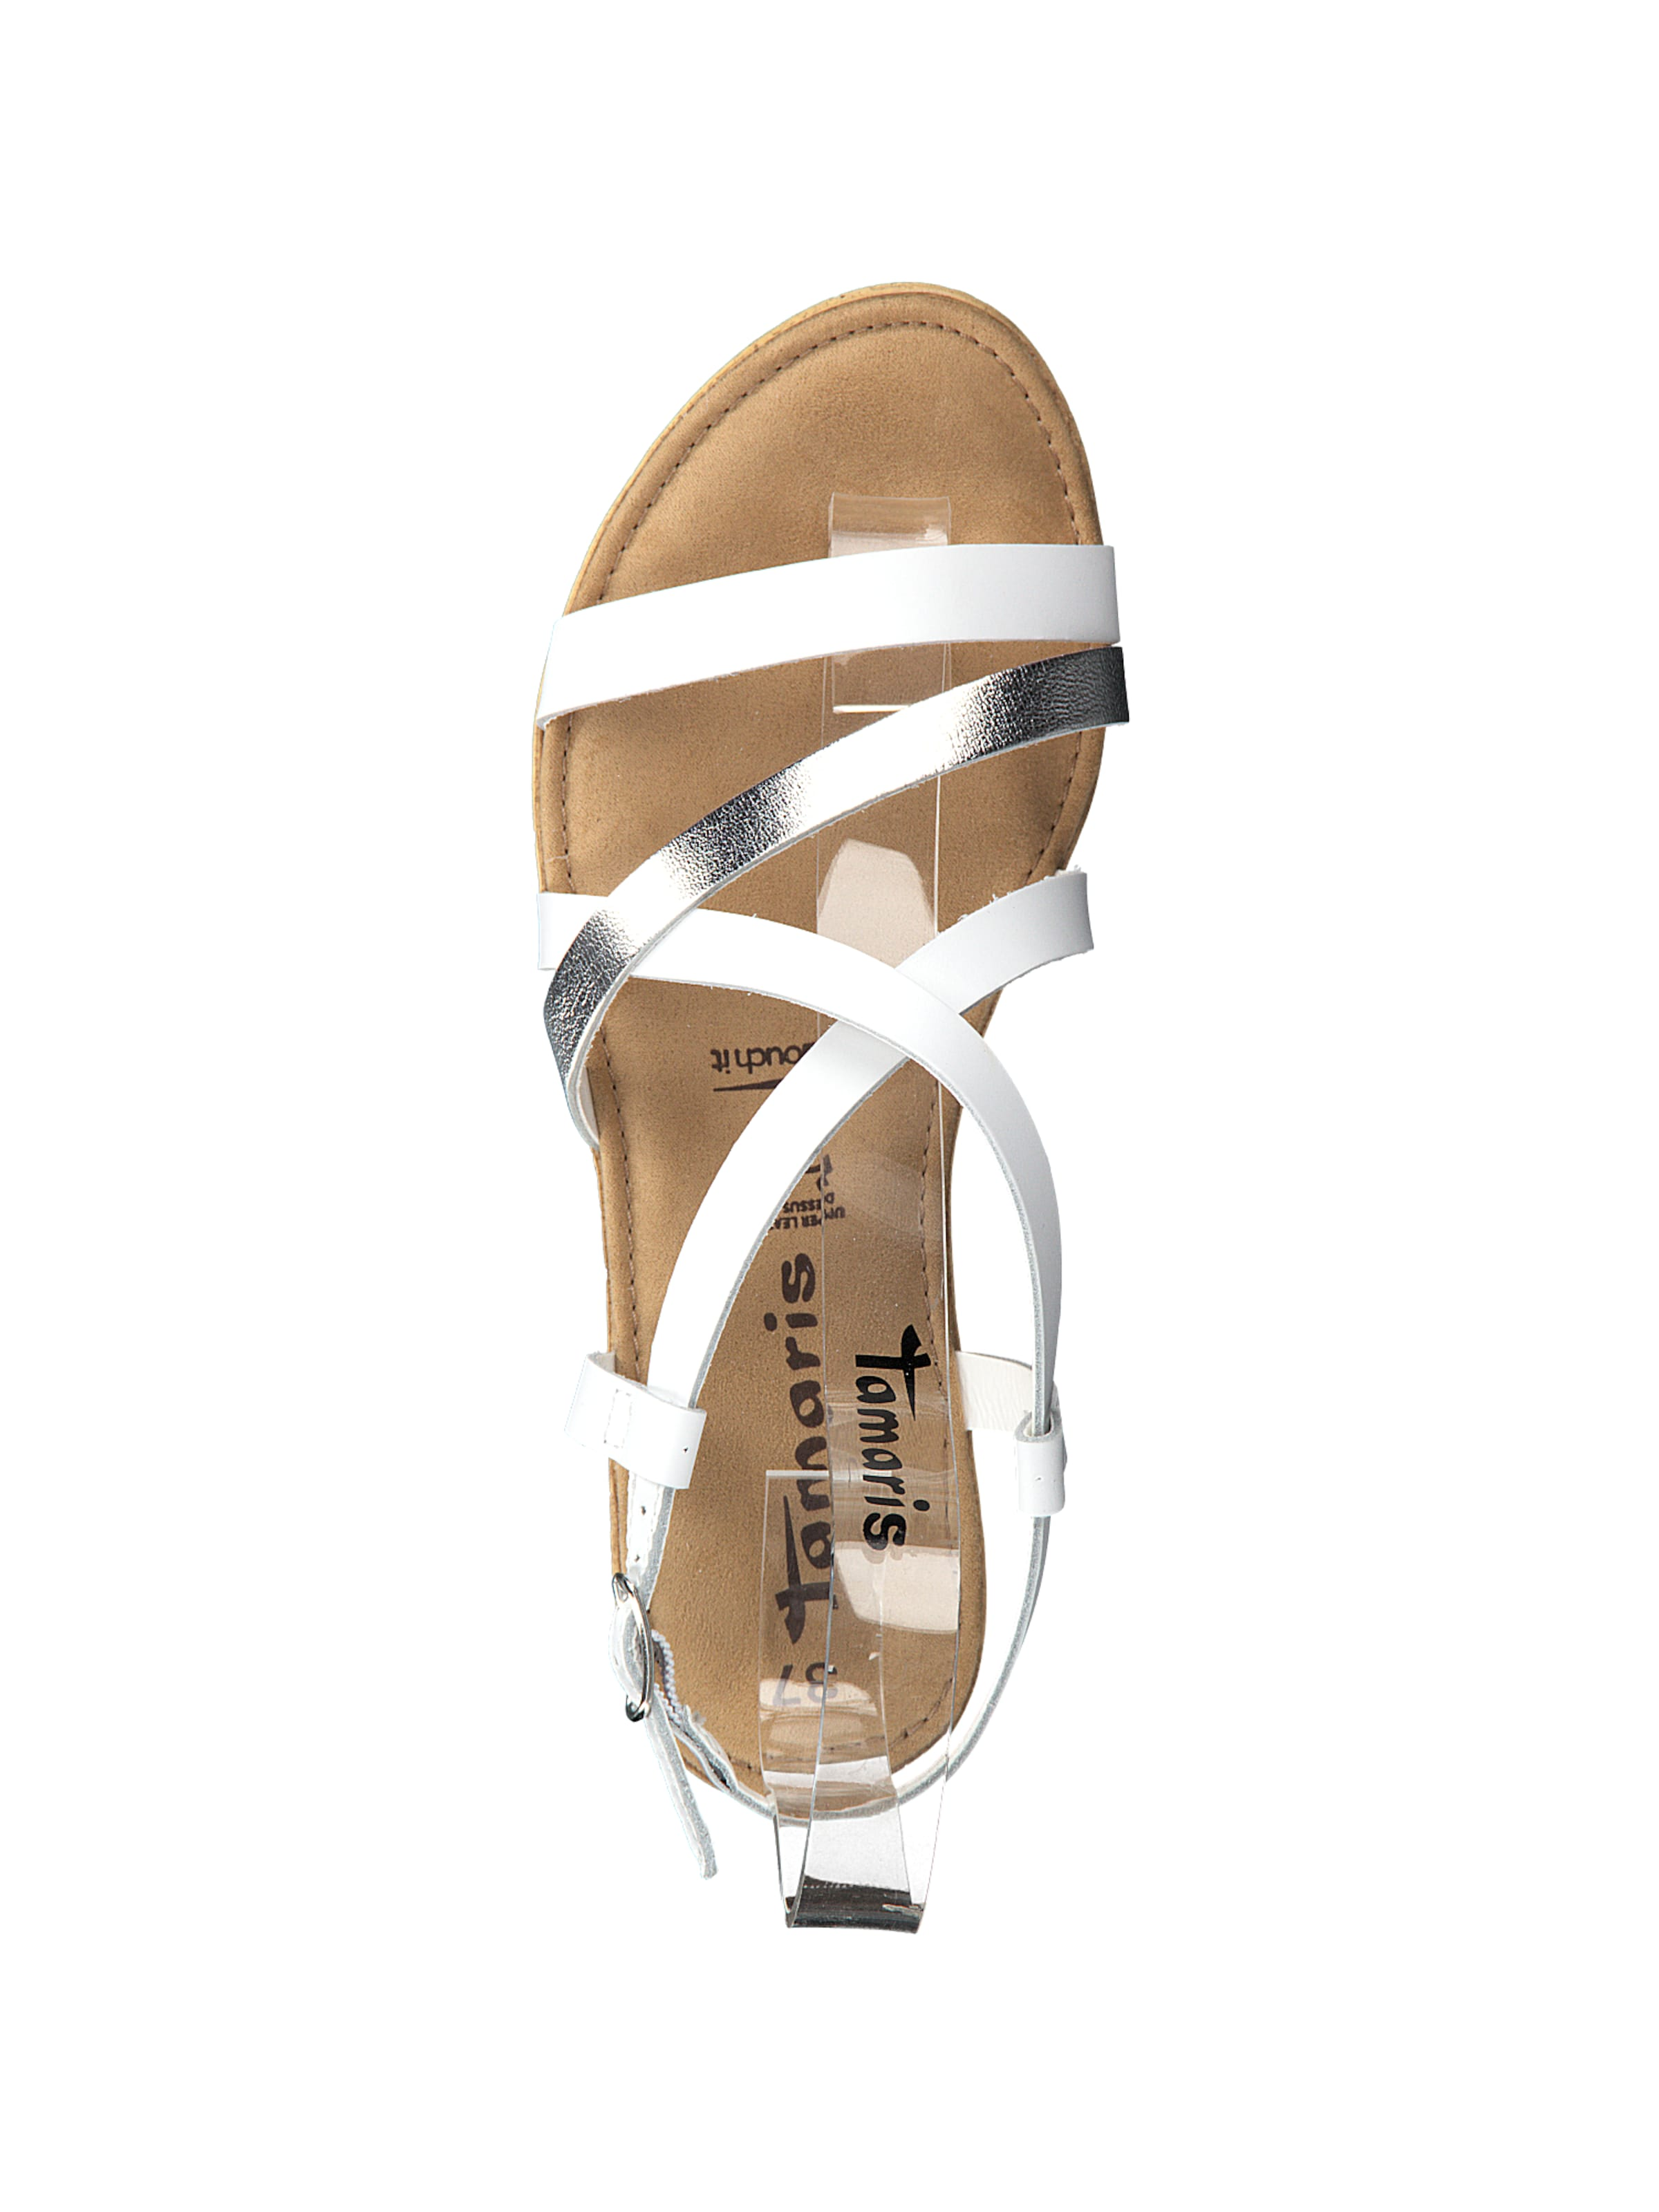 Tamaris Sandale 'keilsandalette' SilberWeiß Tamaris 'keilsandalette' Sandale In SilberWeiß In kXOPiuwZTl